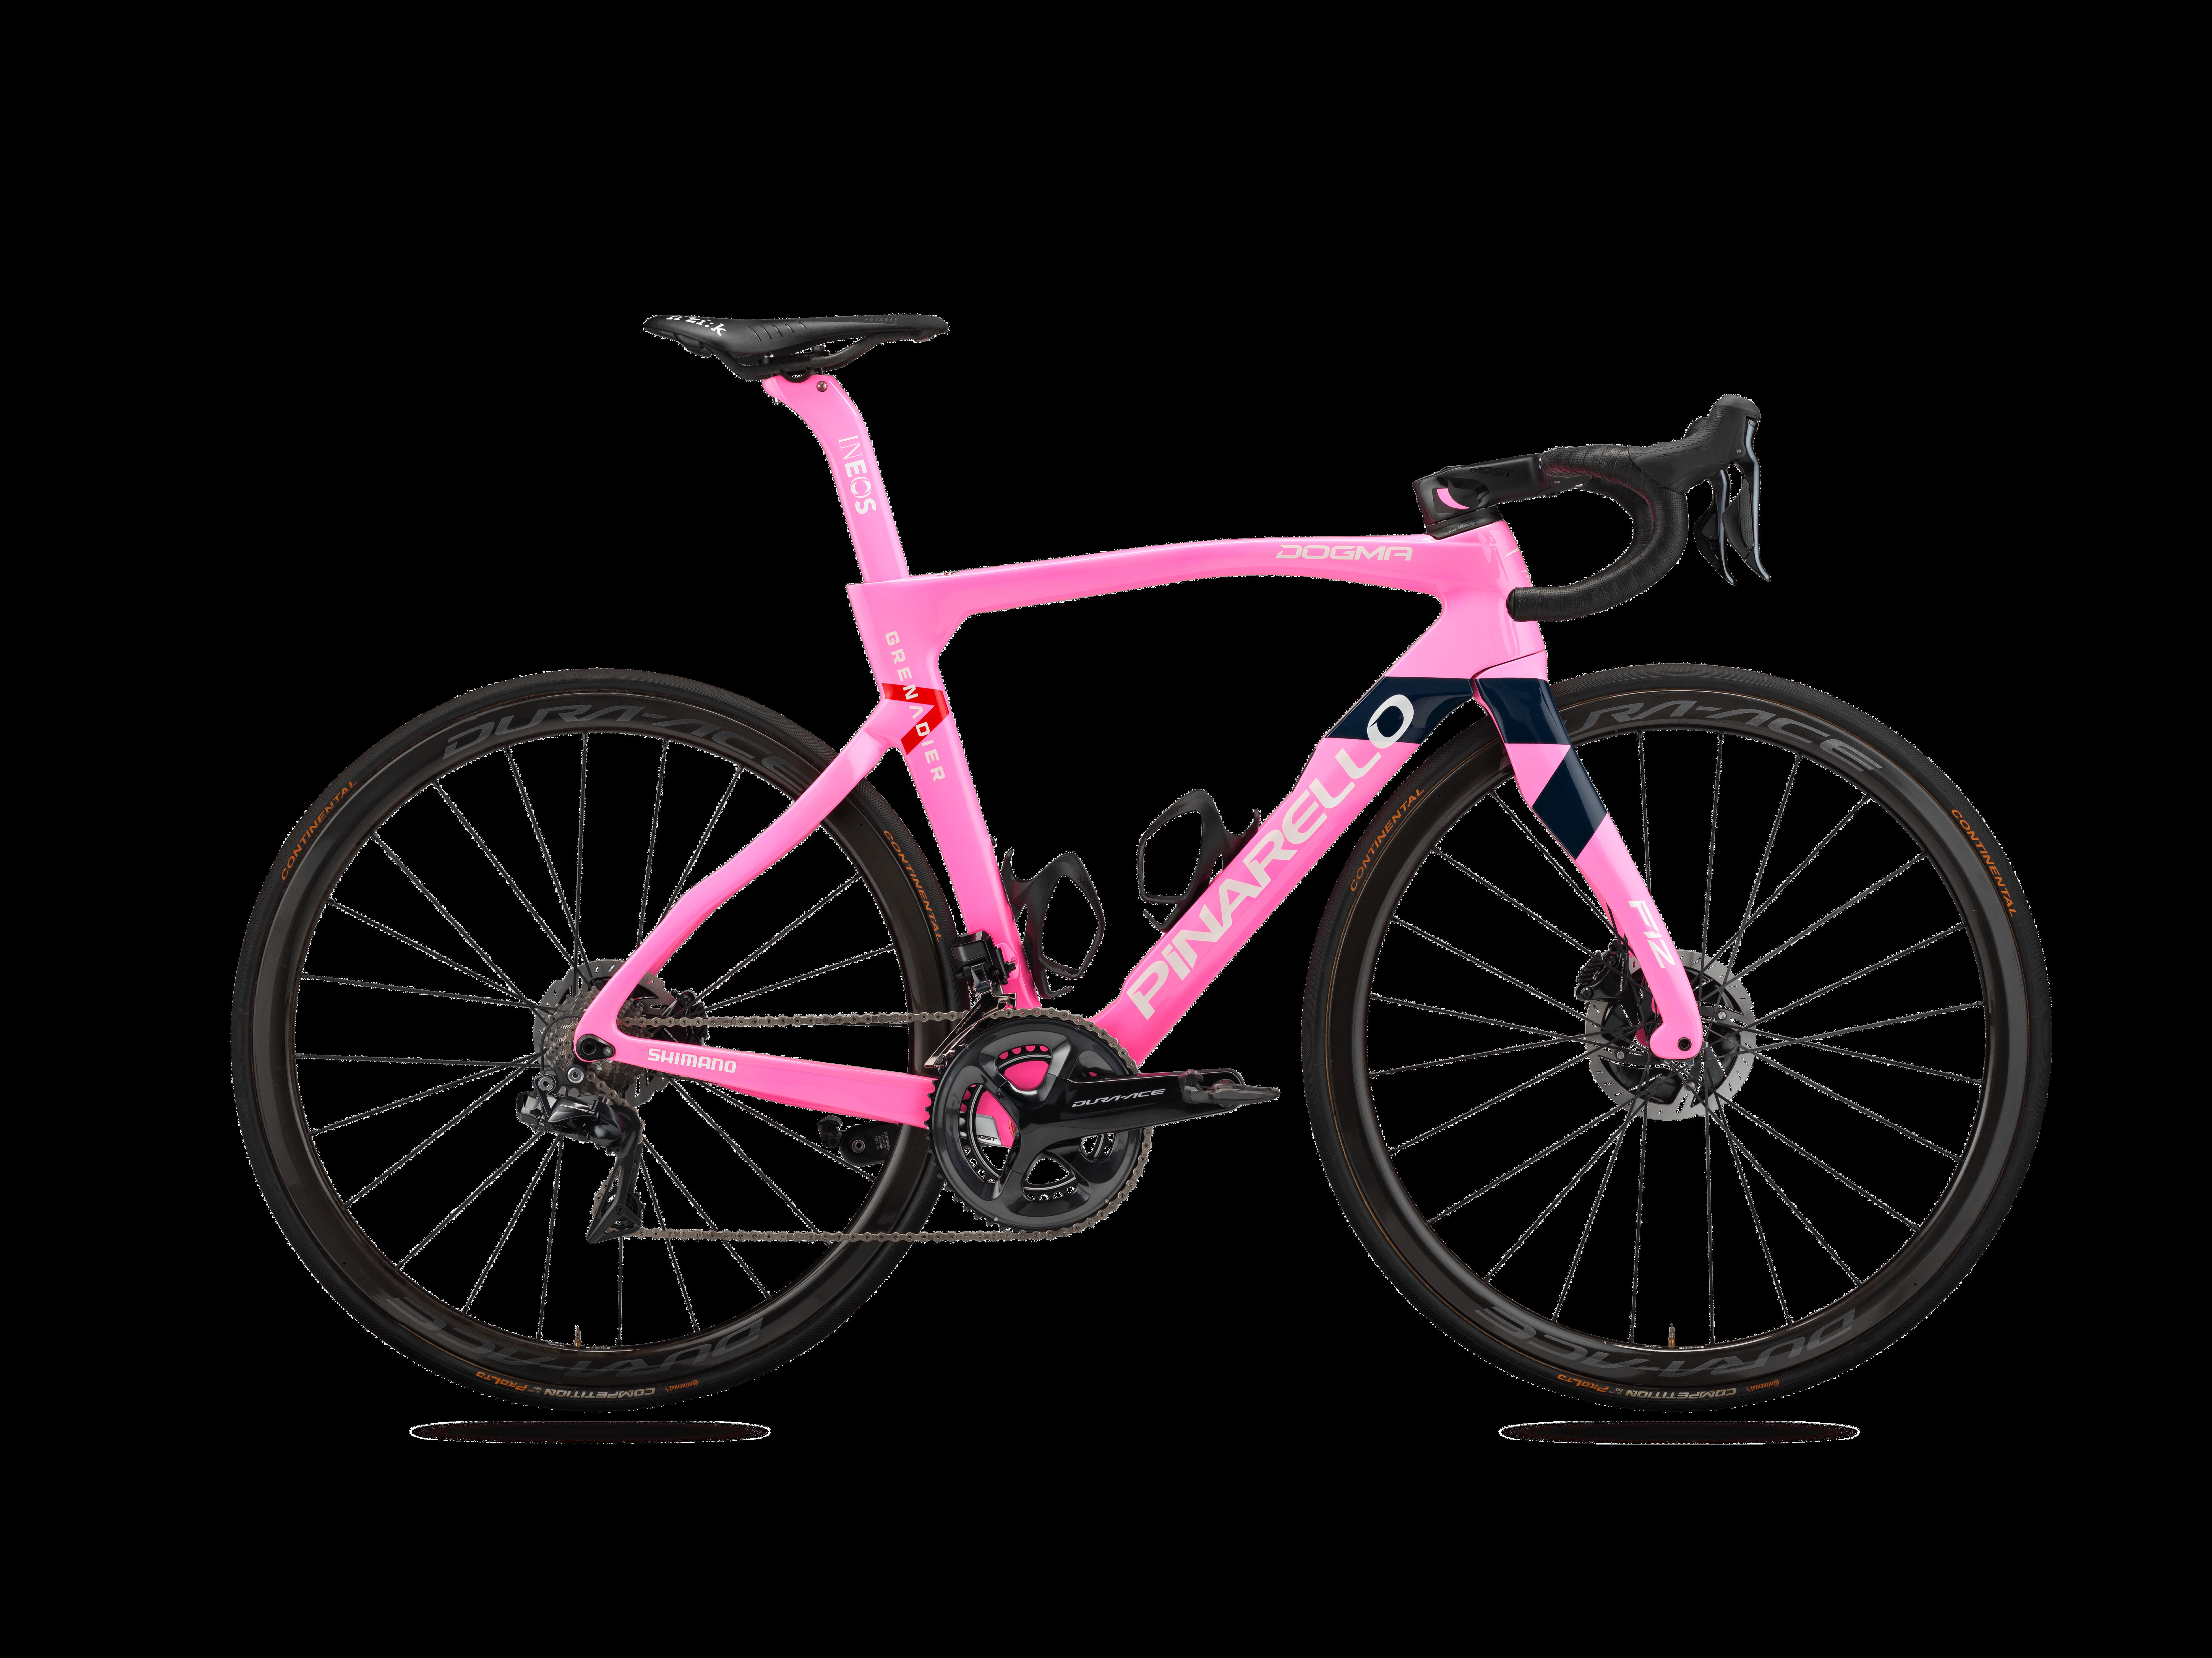 DOGMA F12 - Grenadiers - pink